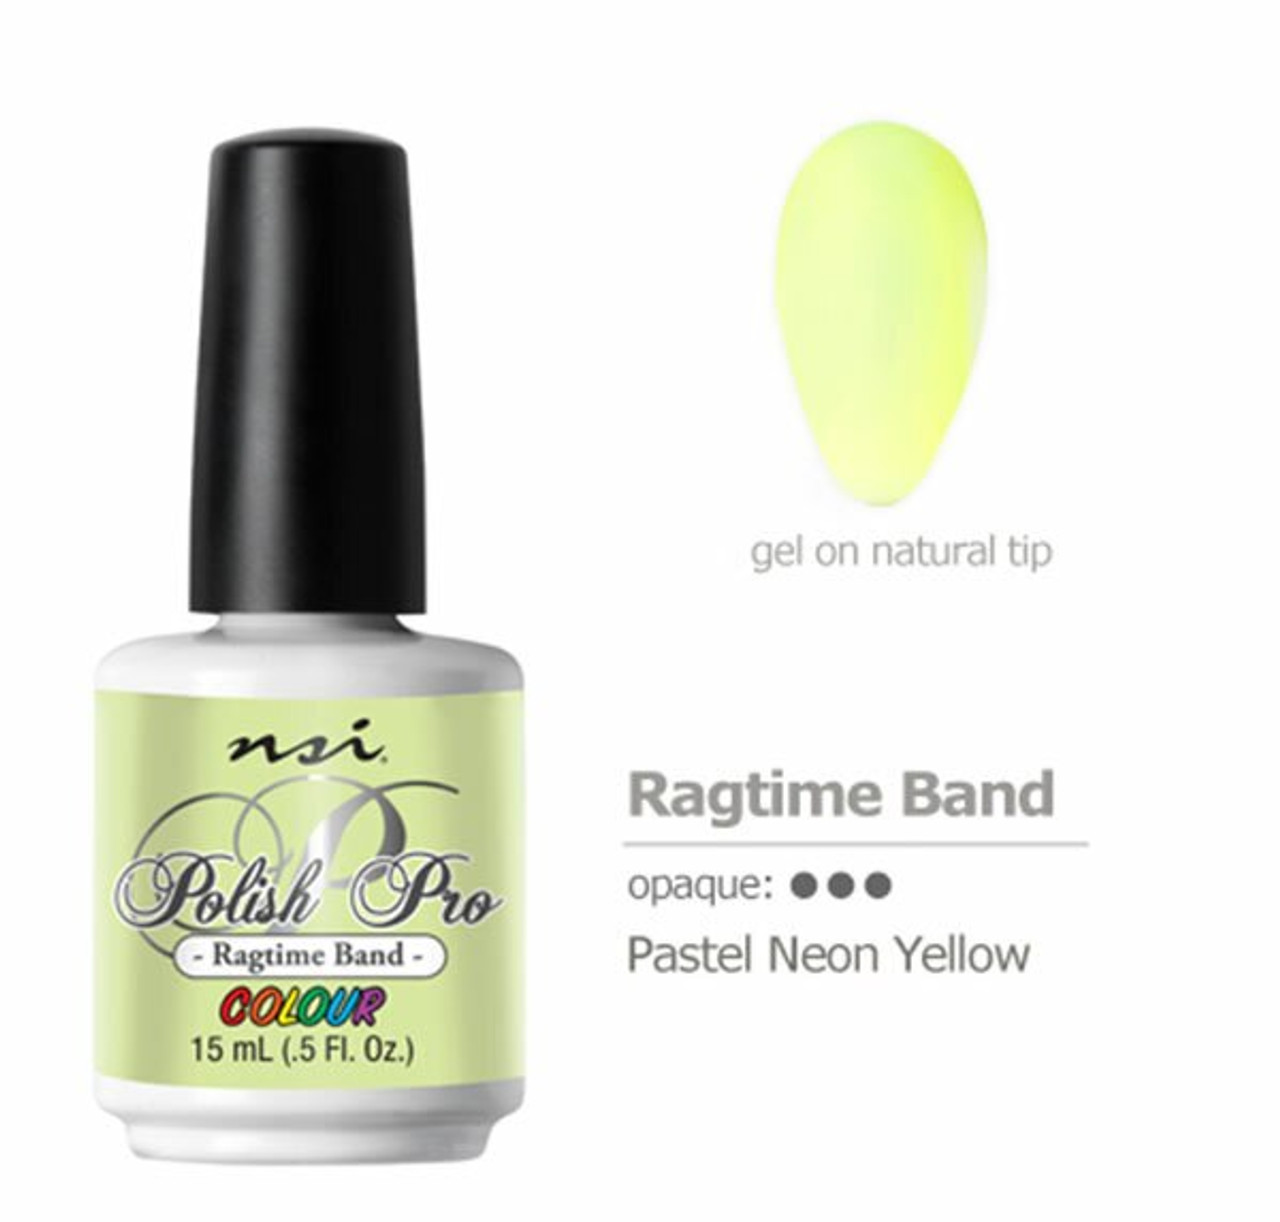 NSI Polish Pro Ragtime Band - 15 mL (.5 Fl. Oz.)